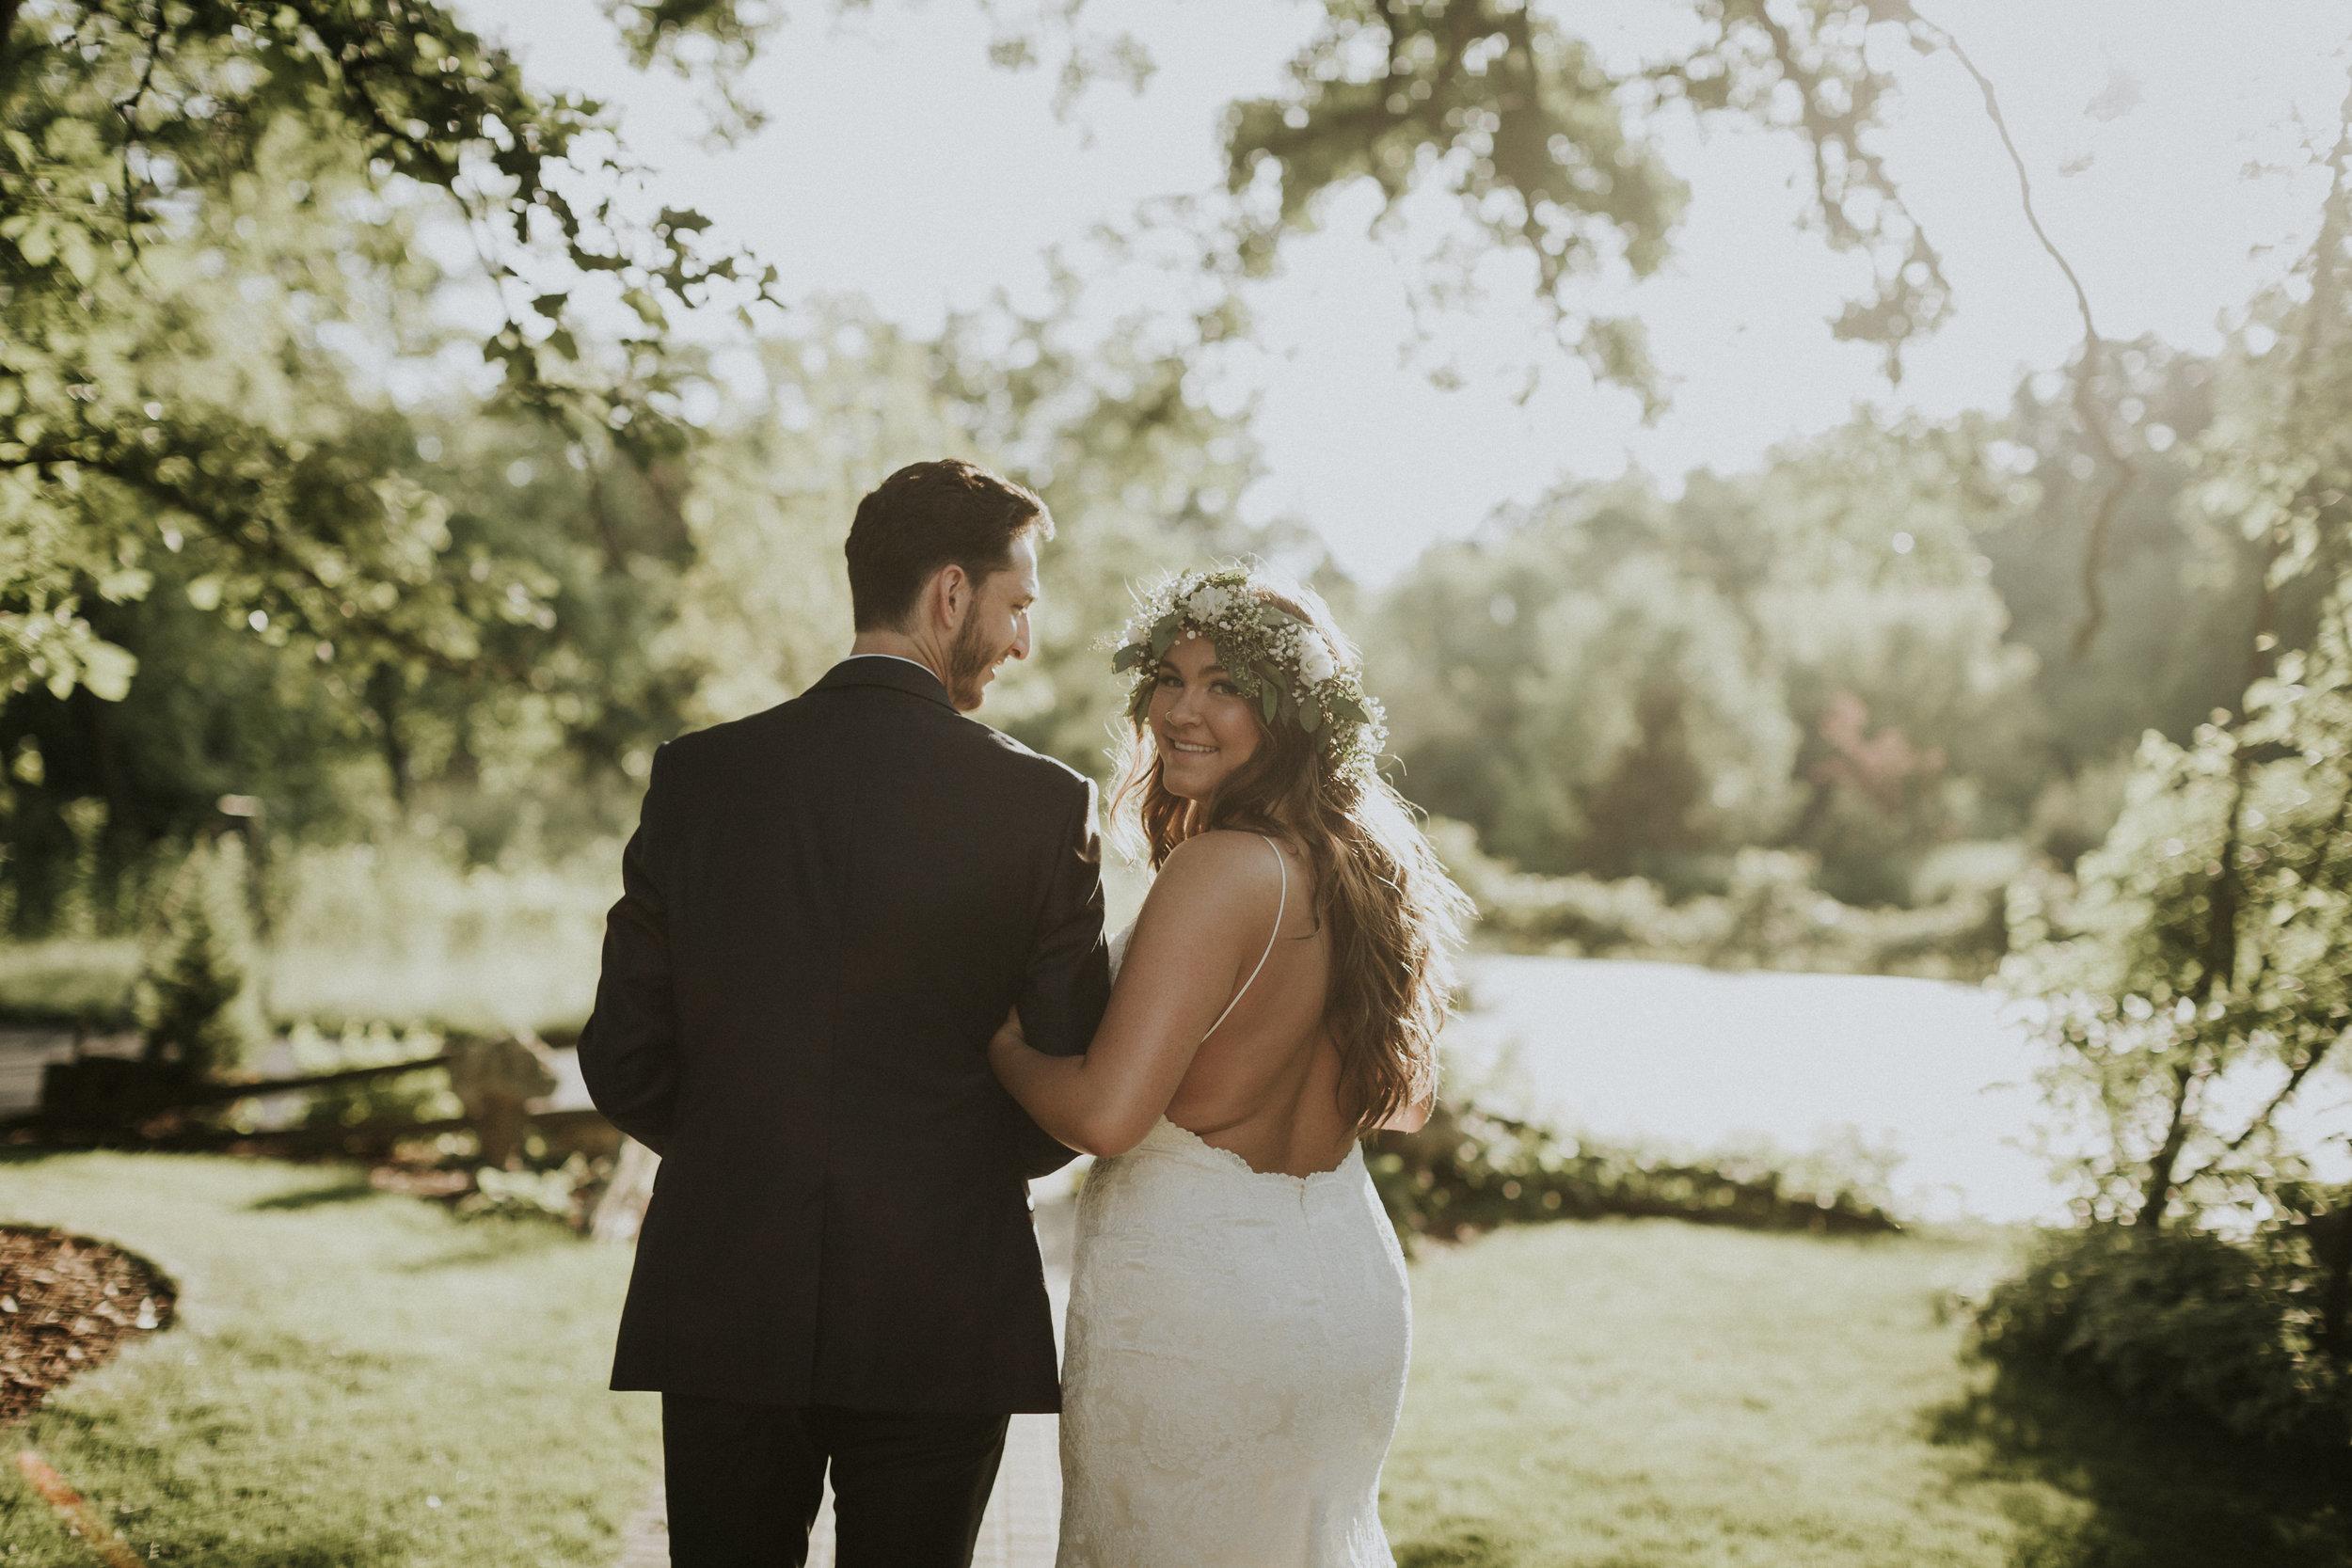 Courtney+Lawrence_Wedding_662.jpg